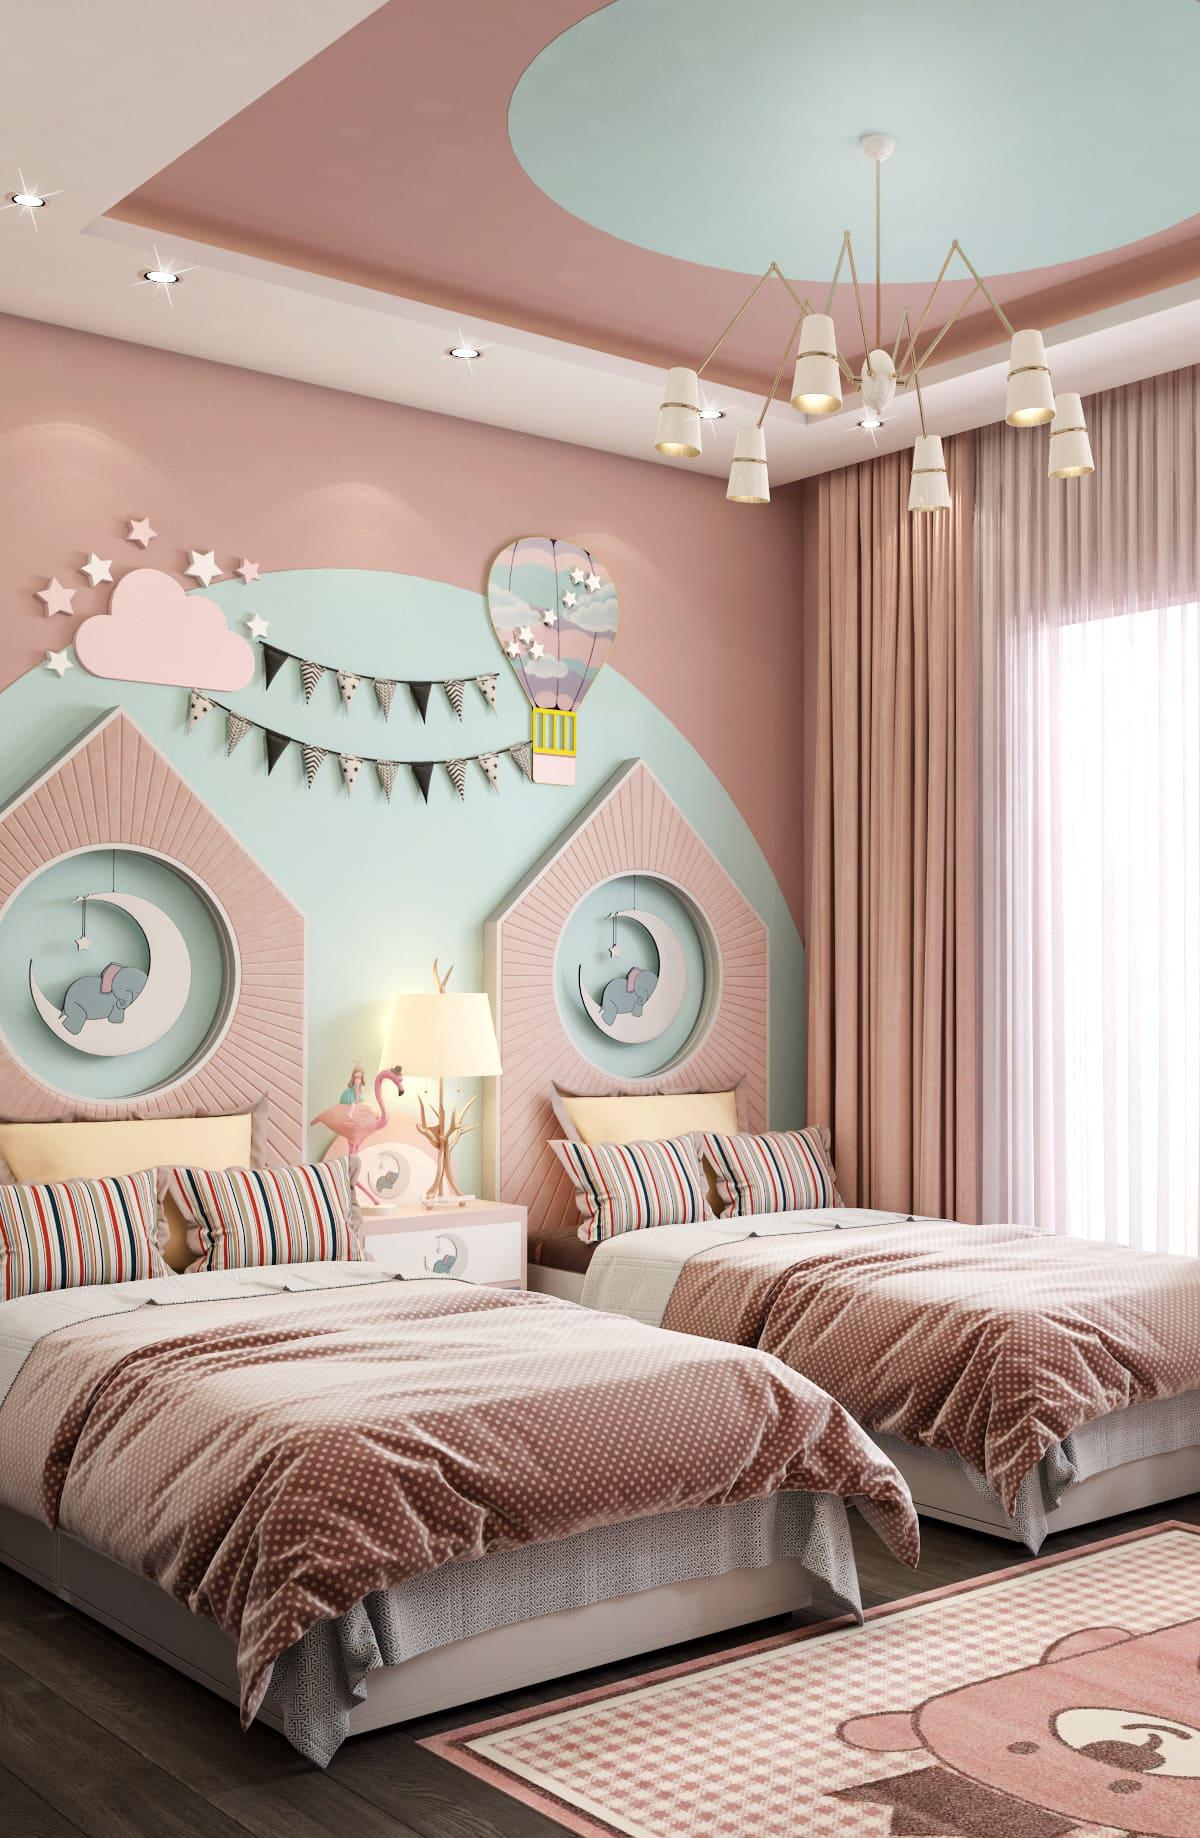 интерьер детской комнаты фото 86